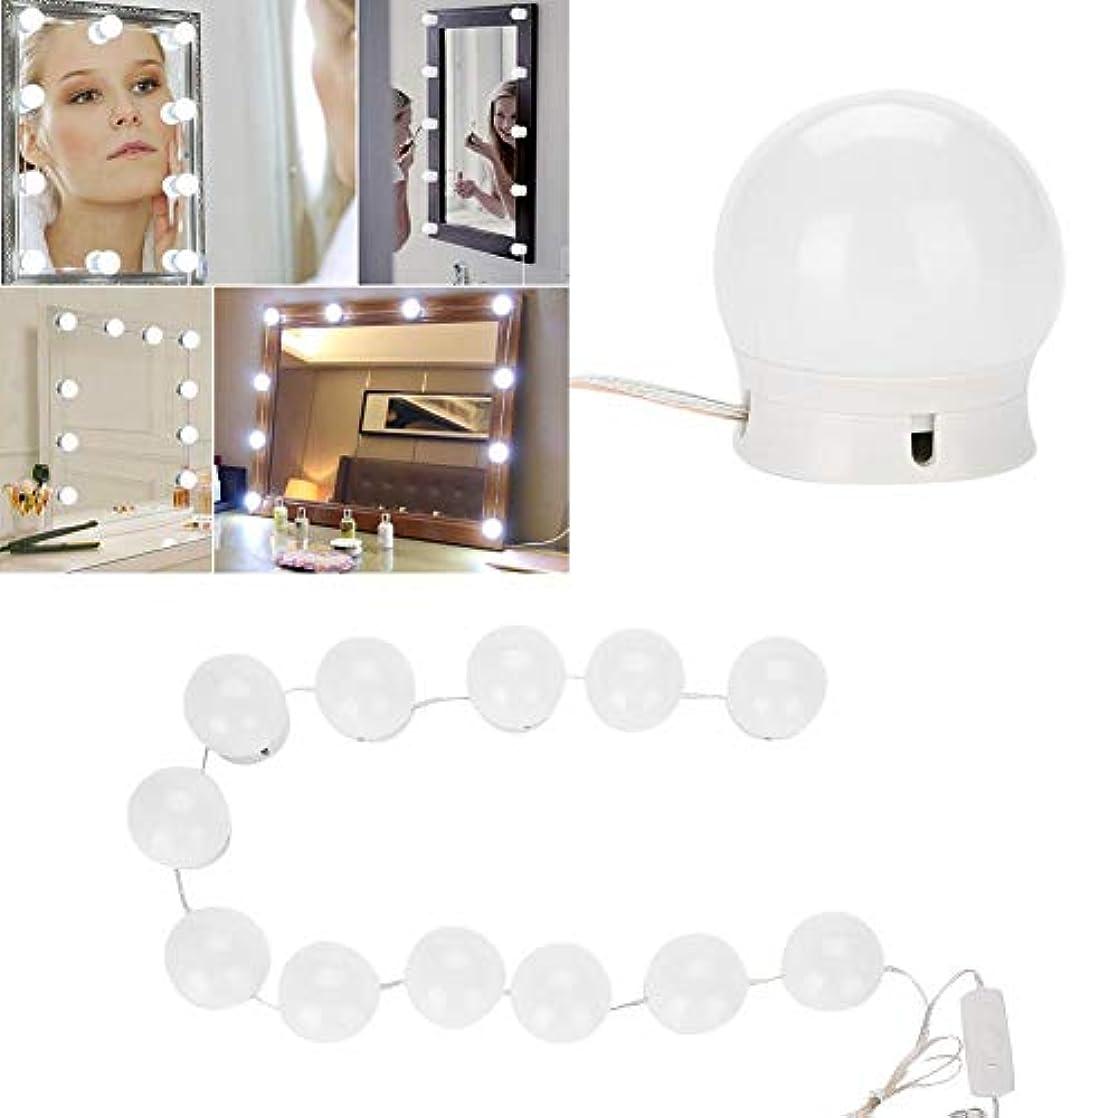 Semme LEDの虚栄心ミラーライトキット、化粧鏡のためのハリウッドの化粧鏡ライトストリップ調光対応電球ドレッシング、化粧品、浴室のためのDIY装飾照明設備ストリップ(鏡はIncではありません)